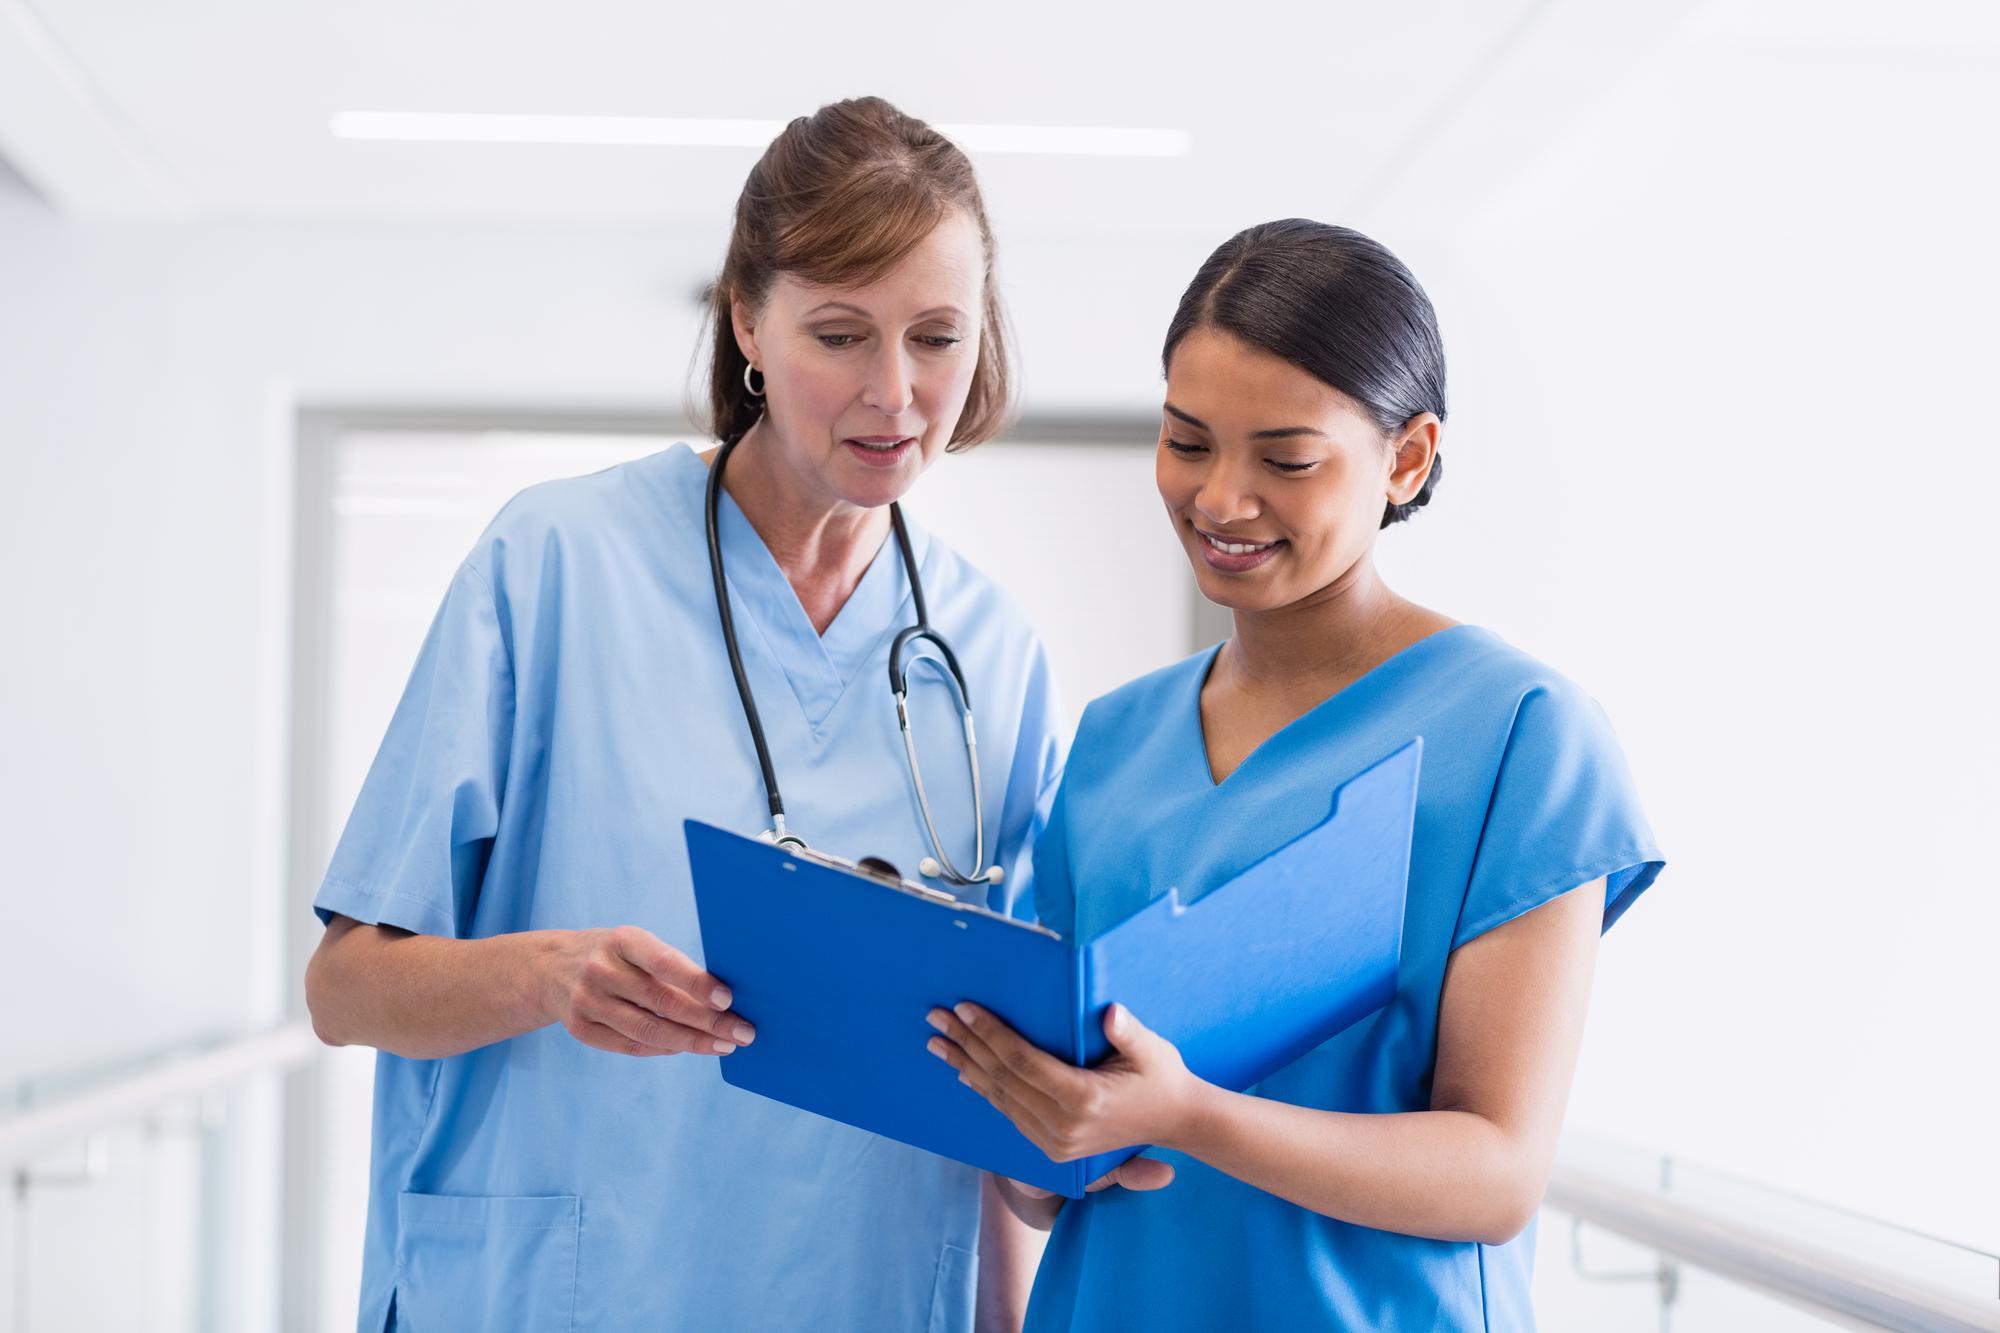 diploma pembantu perubatan